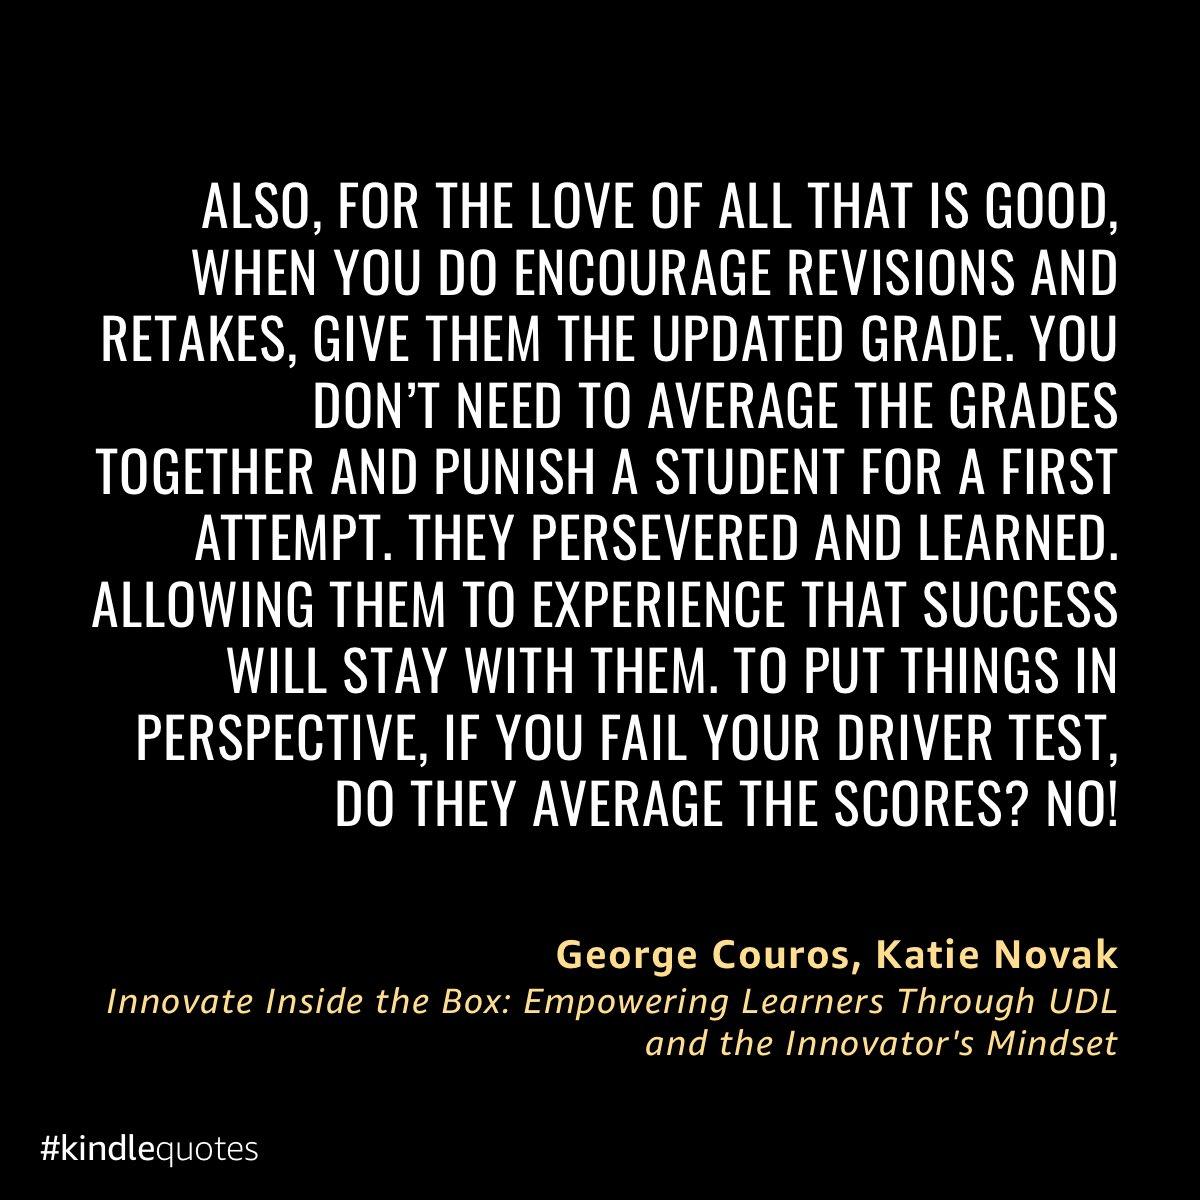 Amen. Let them retake. @KatieNovakUDL #InnovateInsidetheBox a.co/5WZWirb